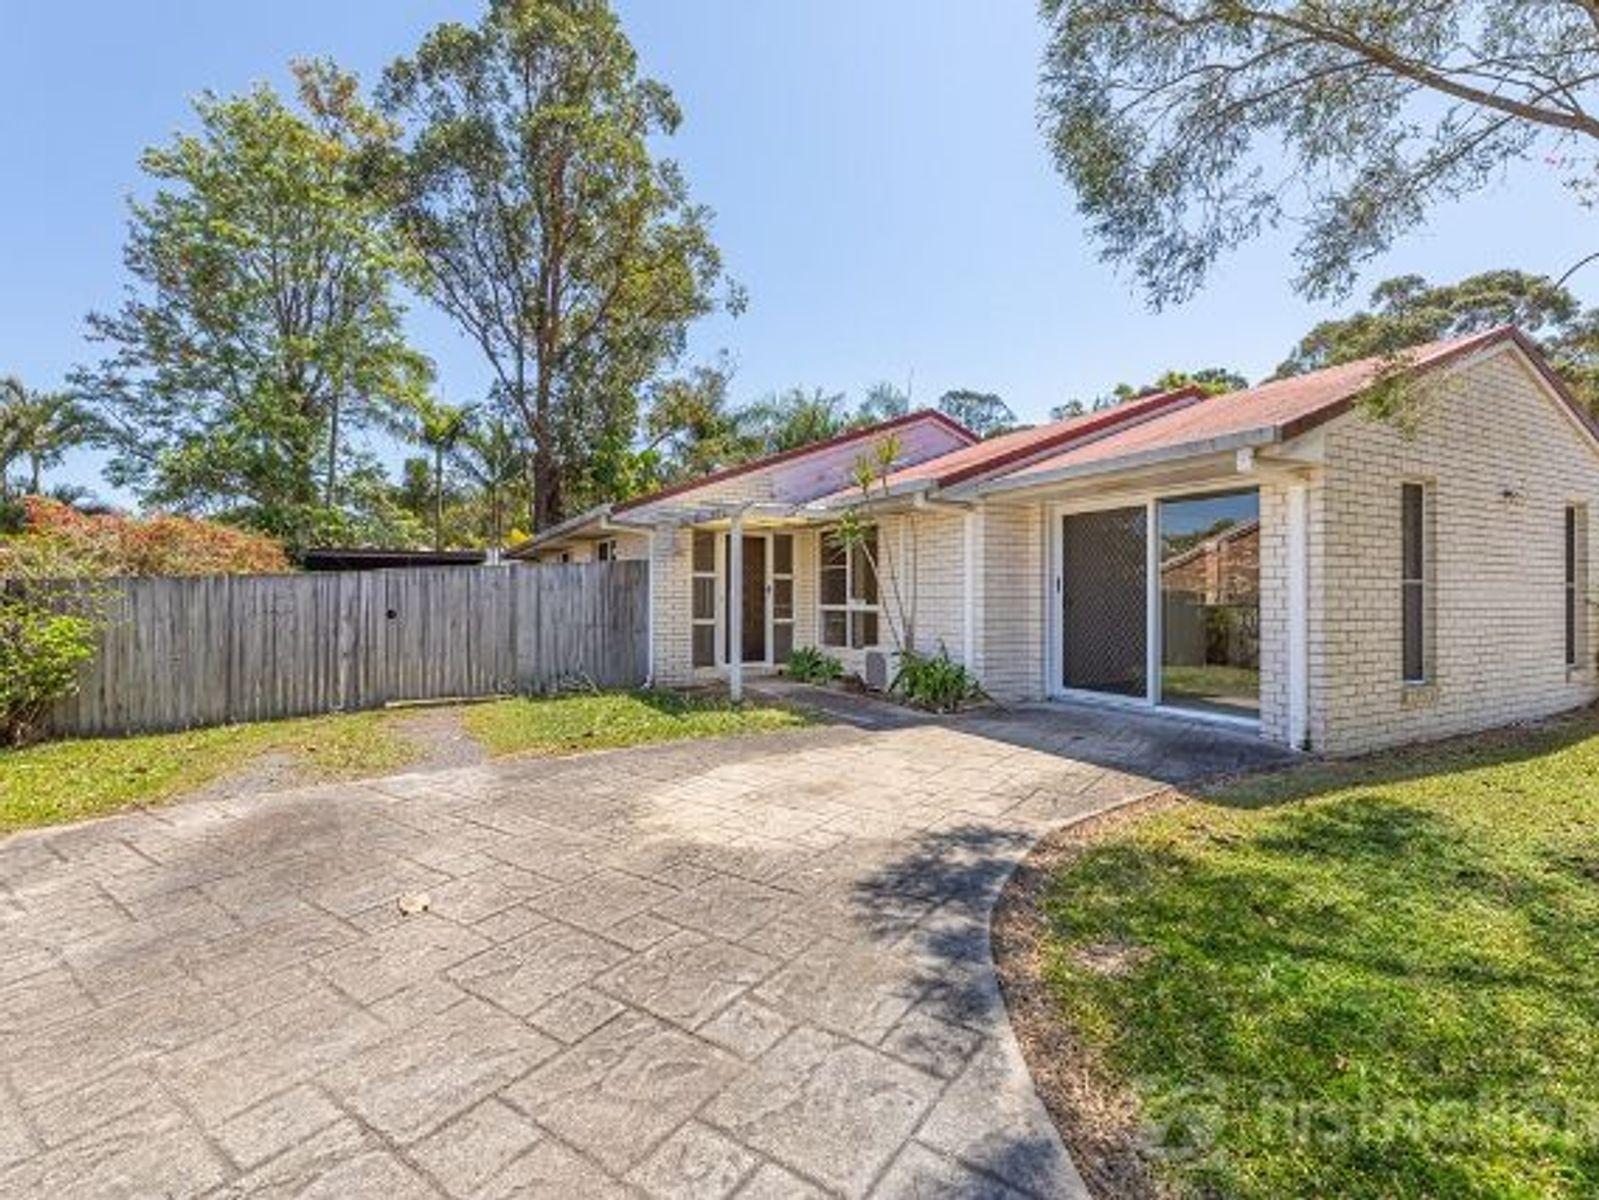 9 Redwood Court, Landsborough, QLD 4550